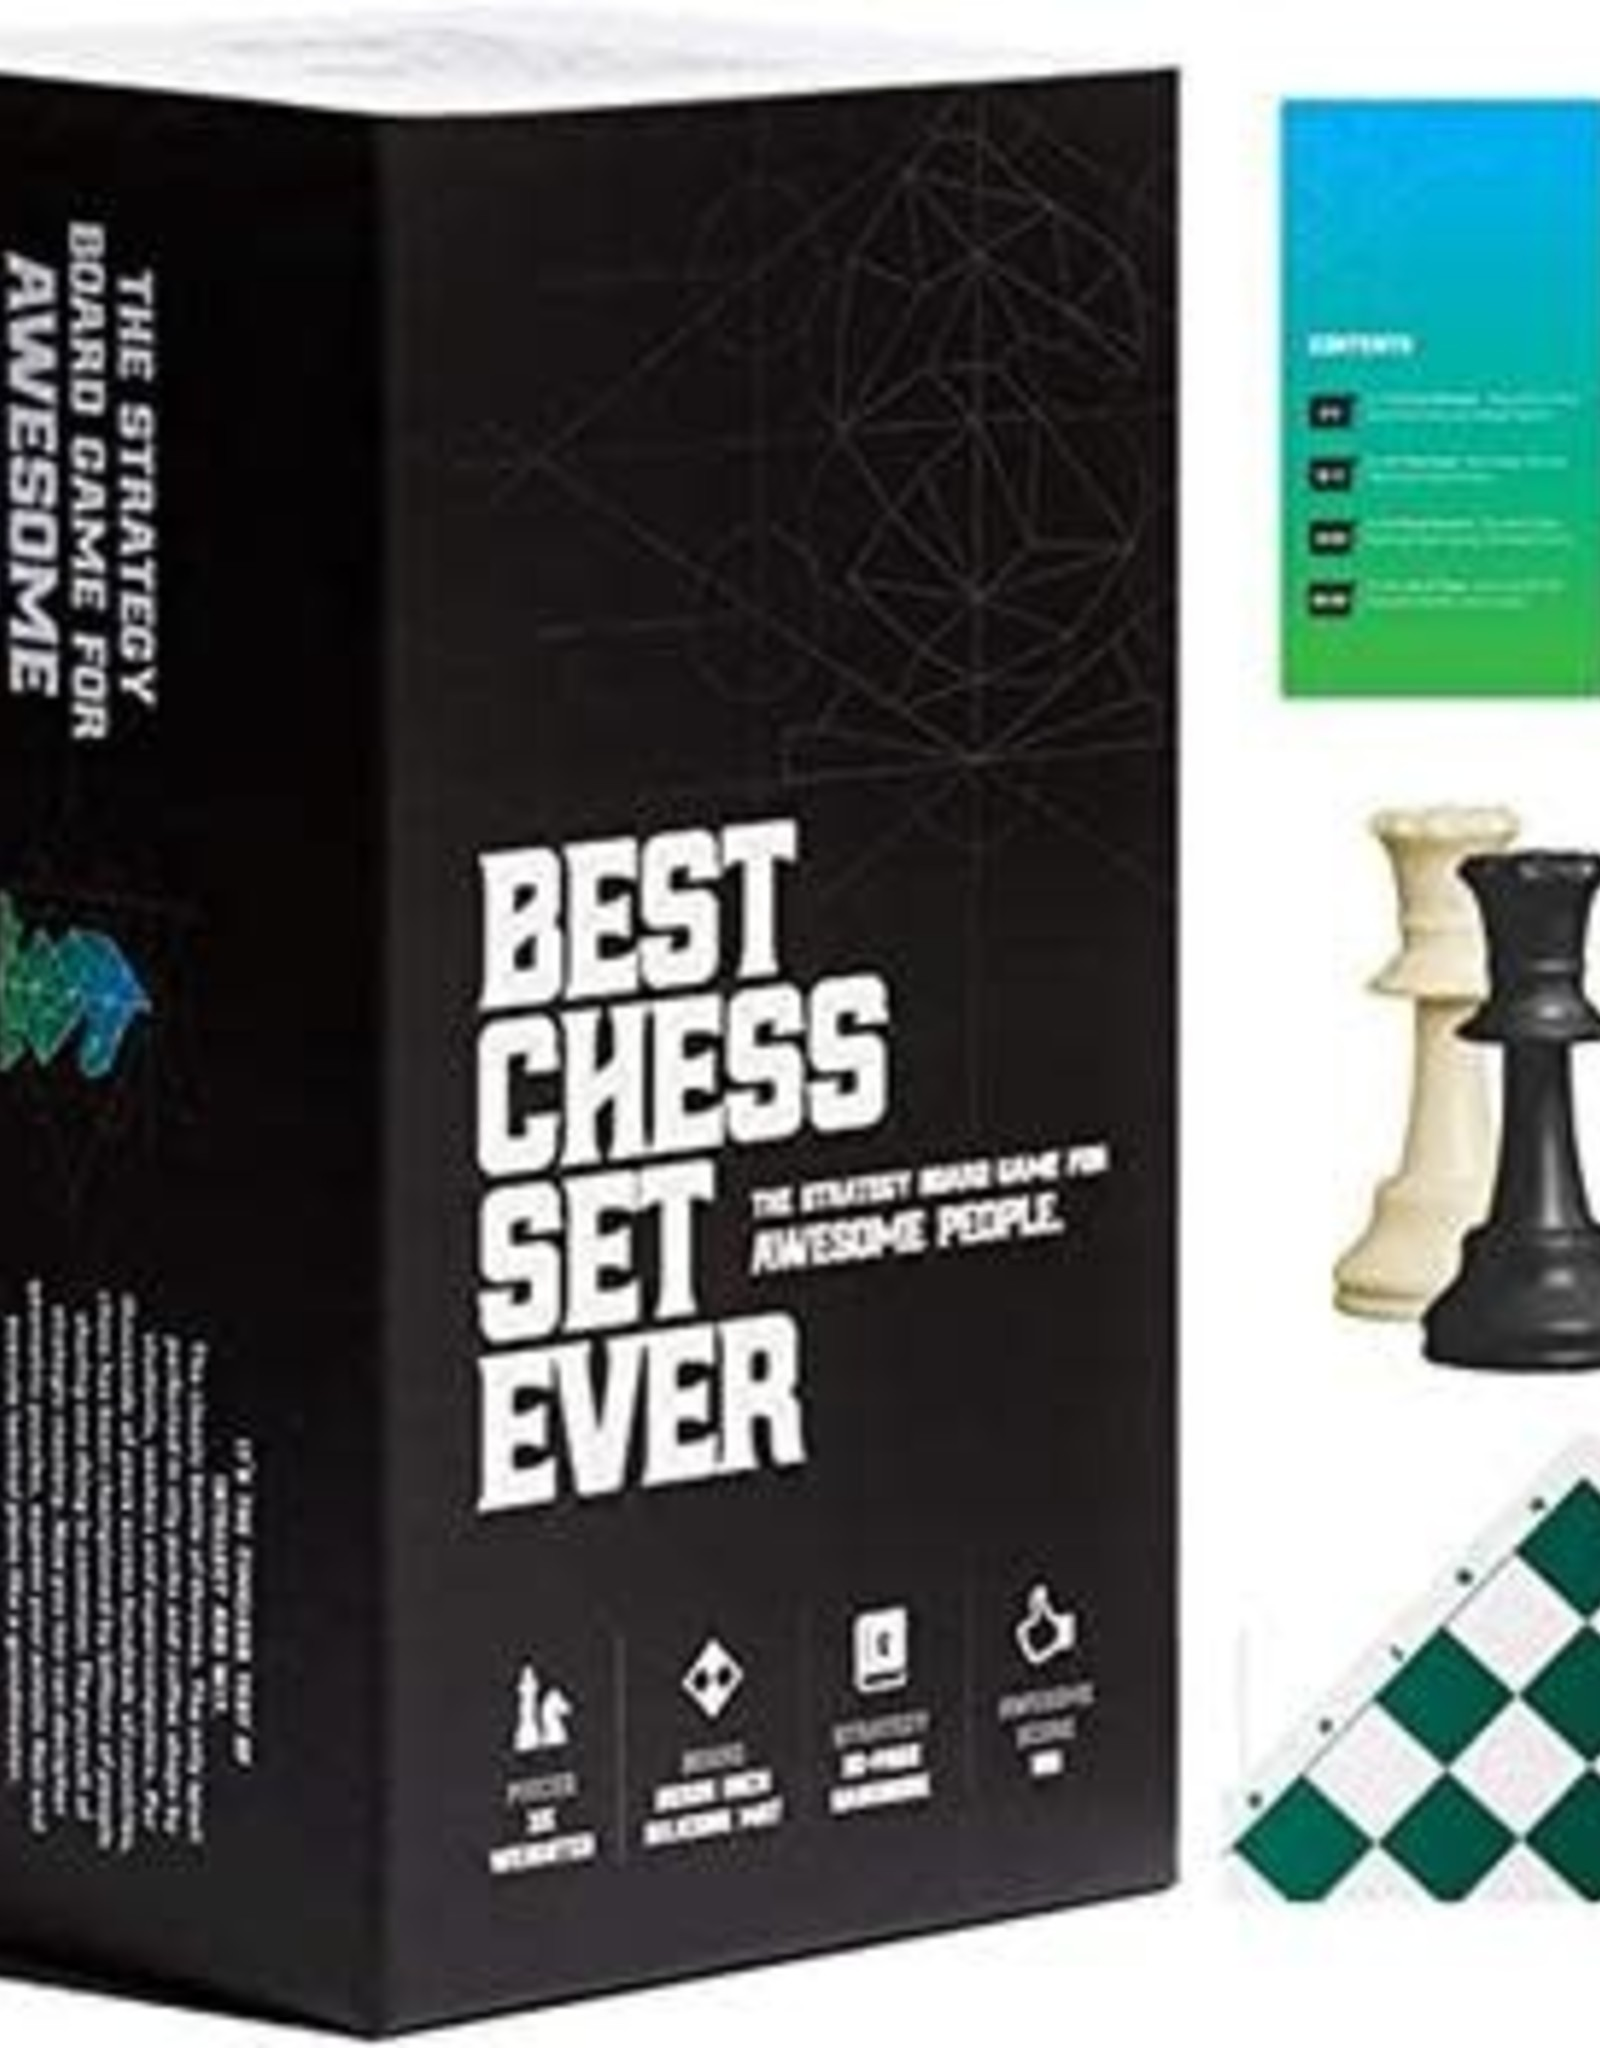 Best Chess Set Ever Best Chess Set Ever (Green)